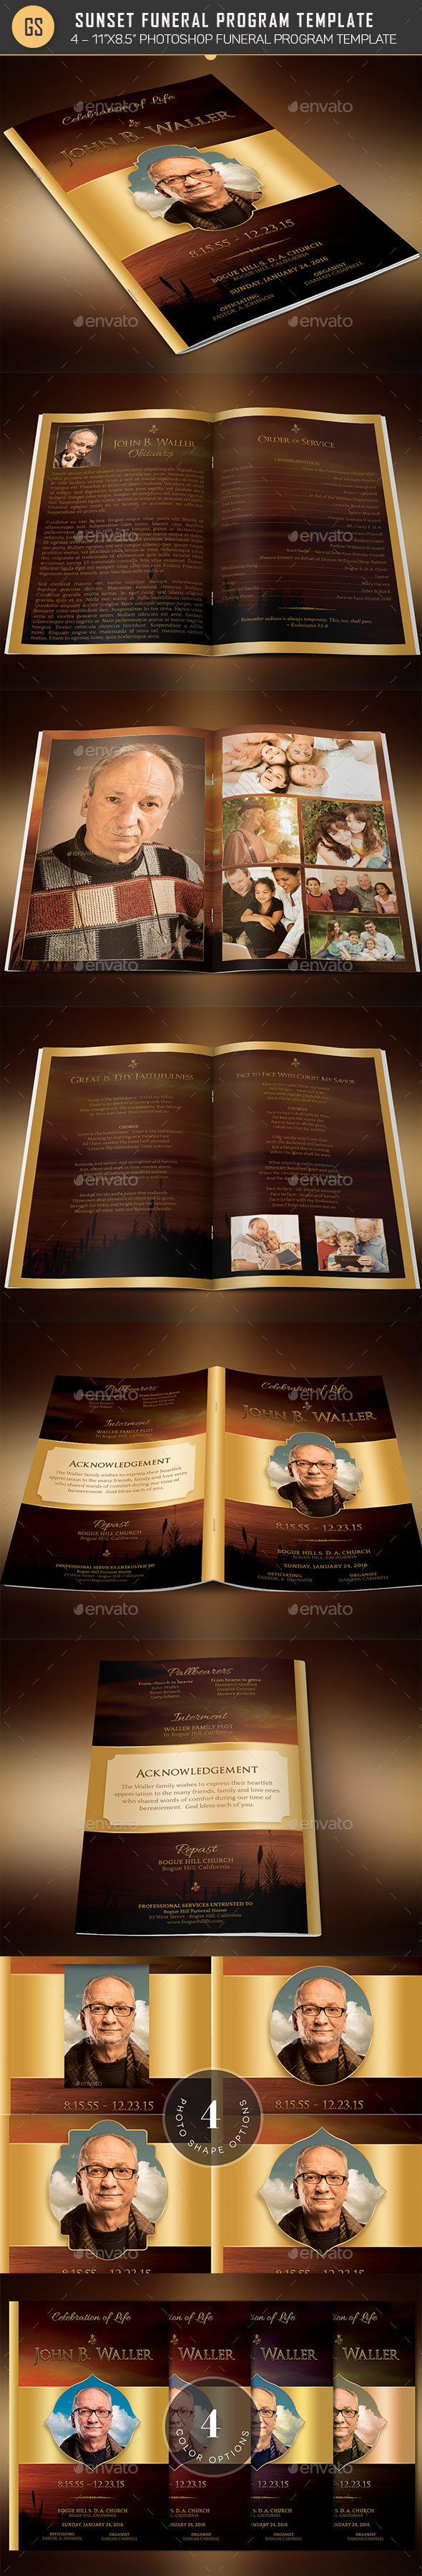 Sunset Funeral Program Template  - Informational Brochures